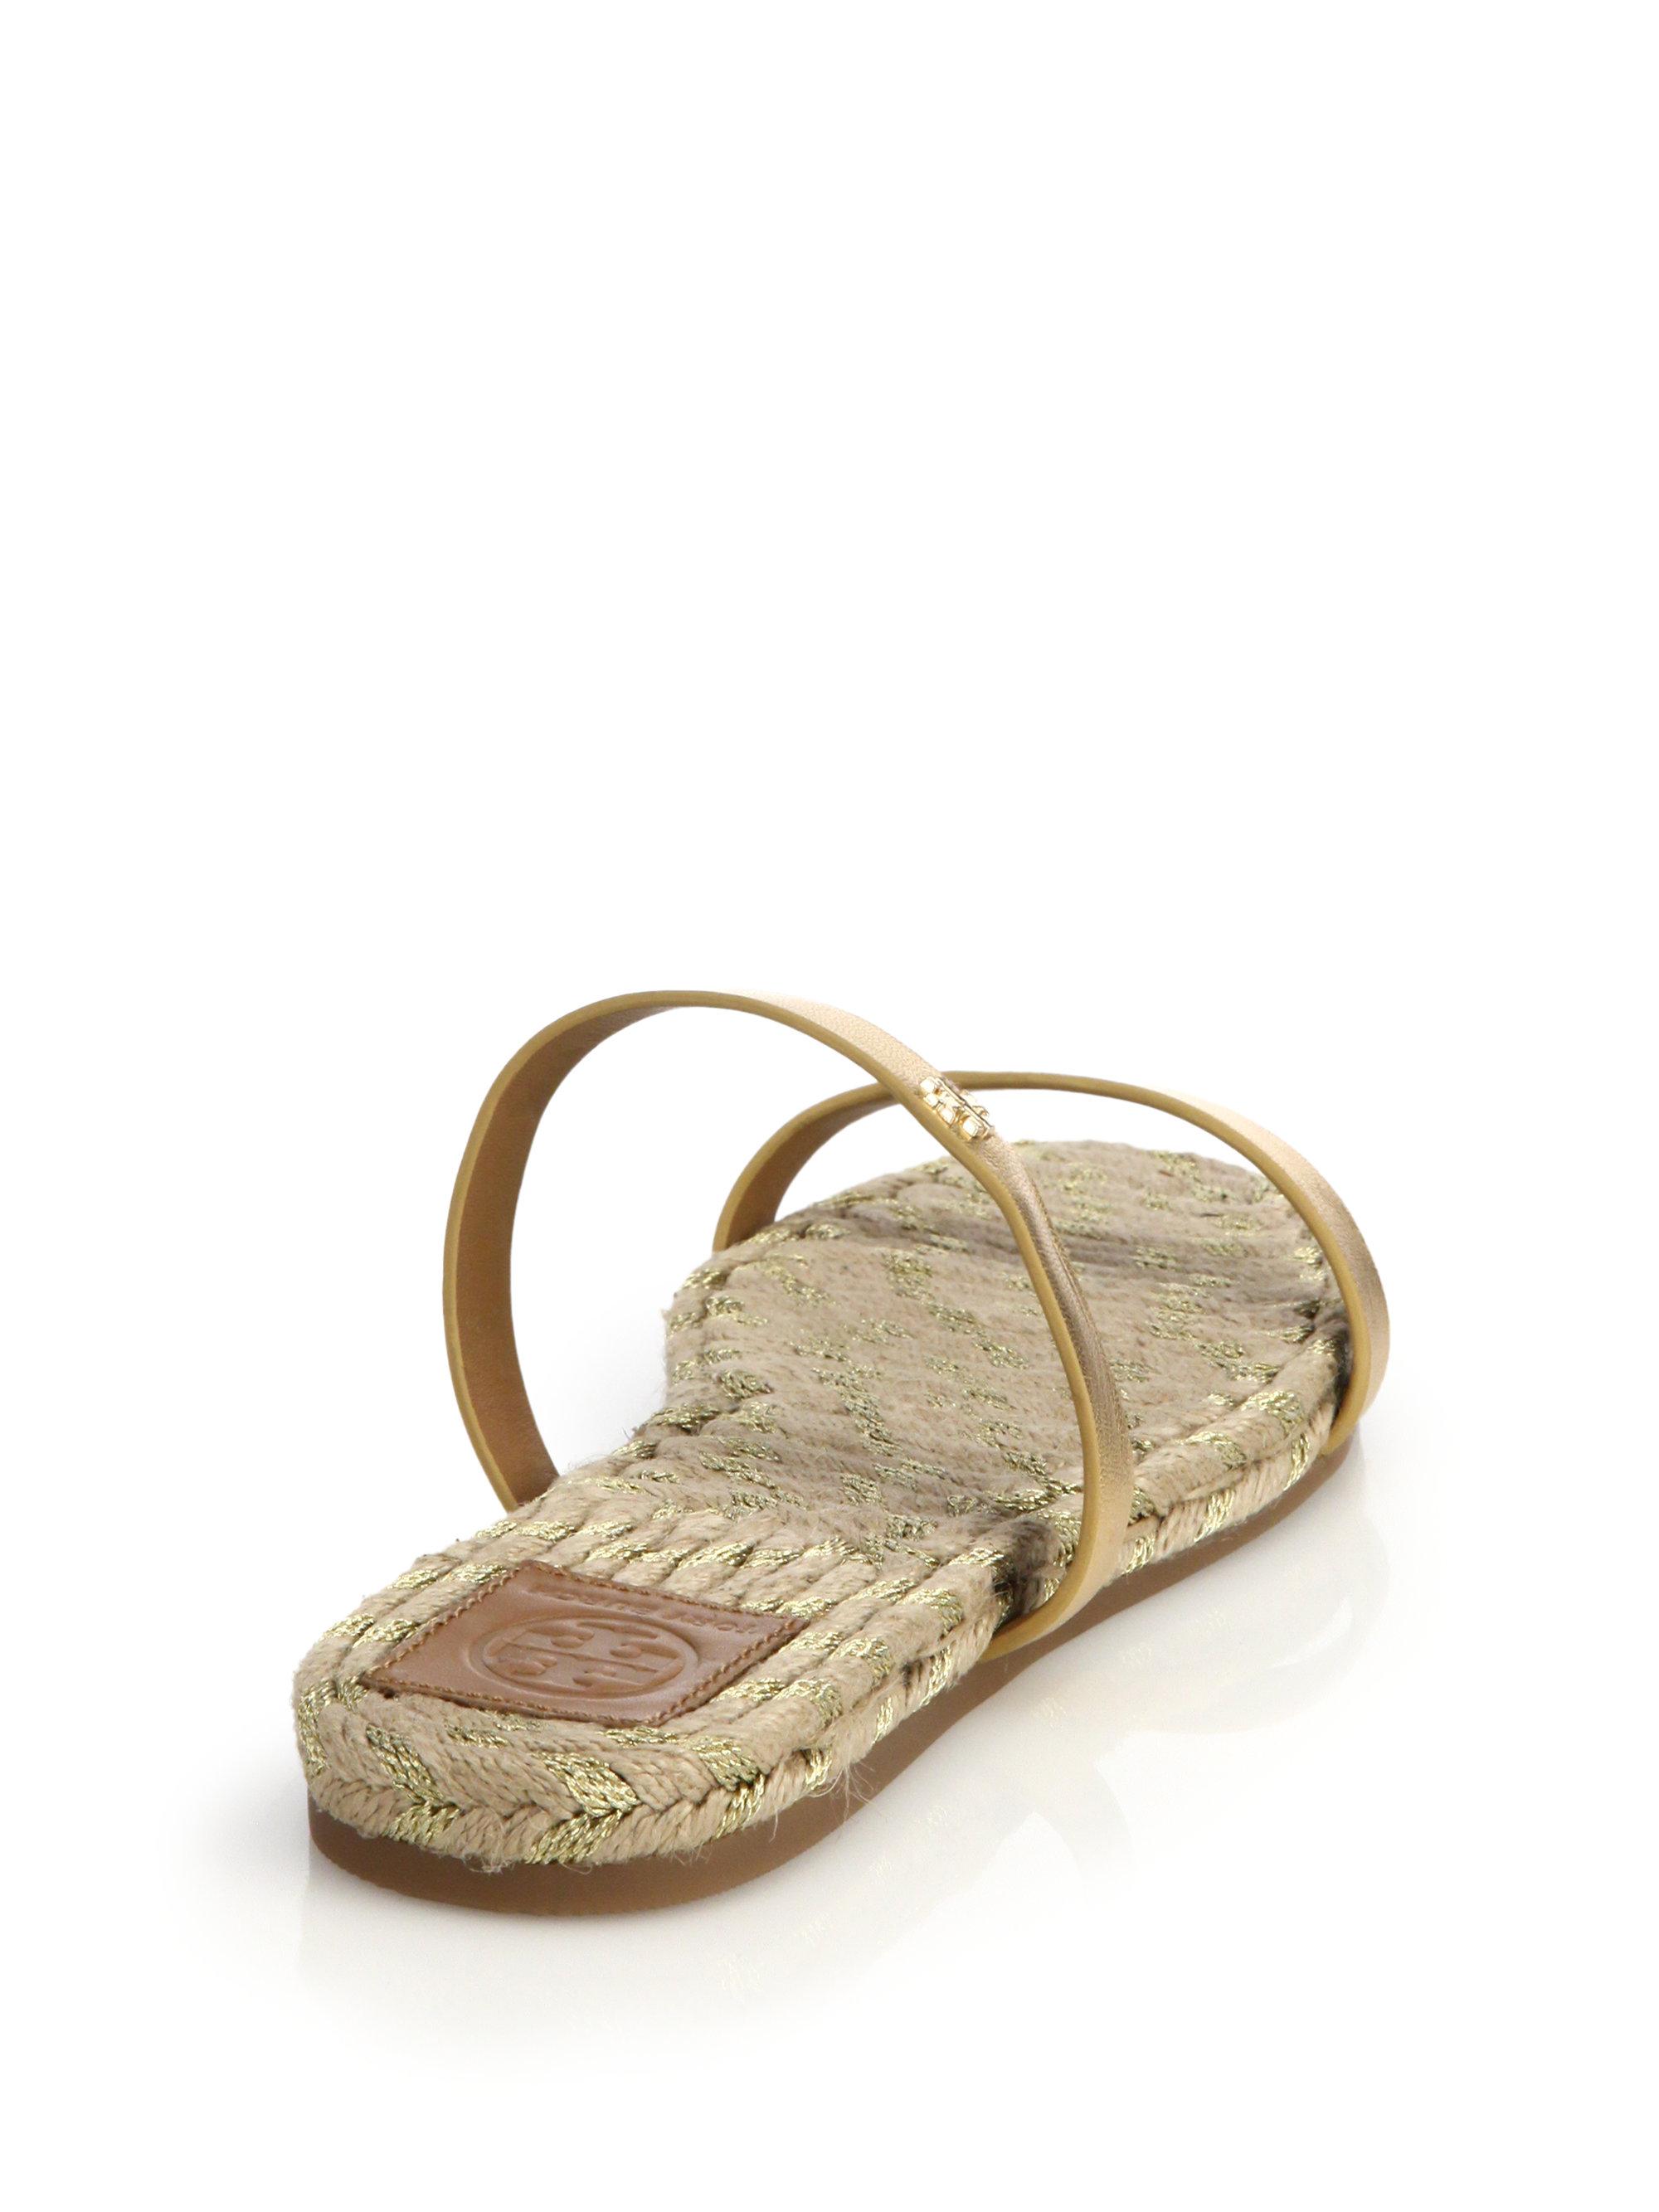 4b2073928895 Lyst - Tory Burch Metallic Leather Espadrille Slide Sandals in Metallic